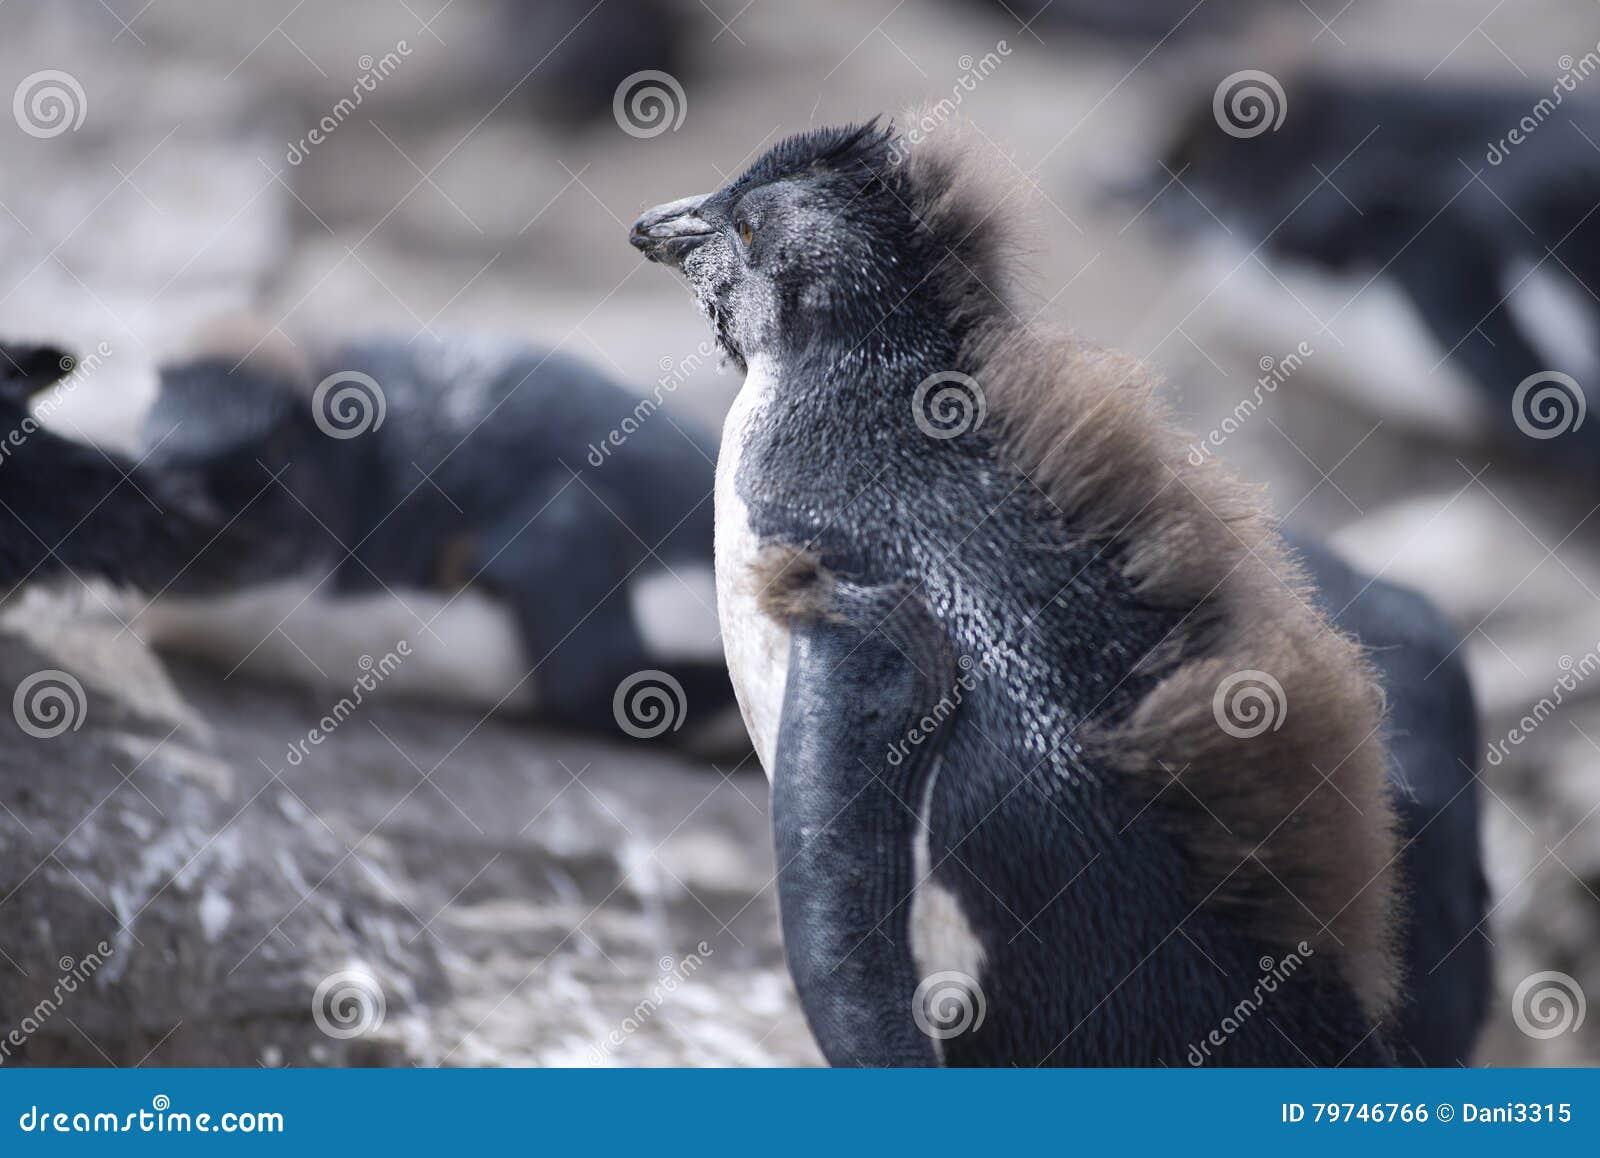 Baby Rockhopper Penguin on The North East Coast of East Falkland